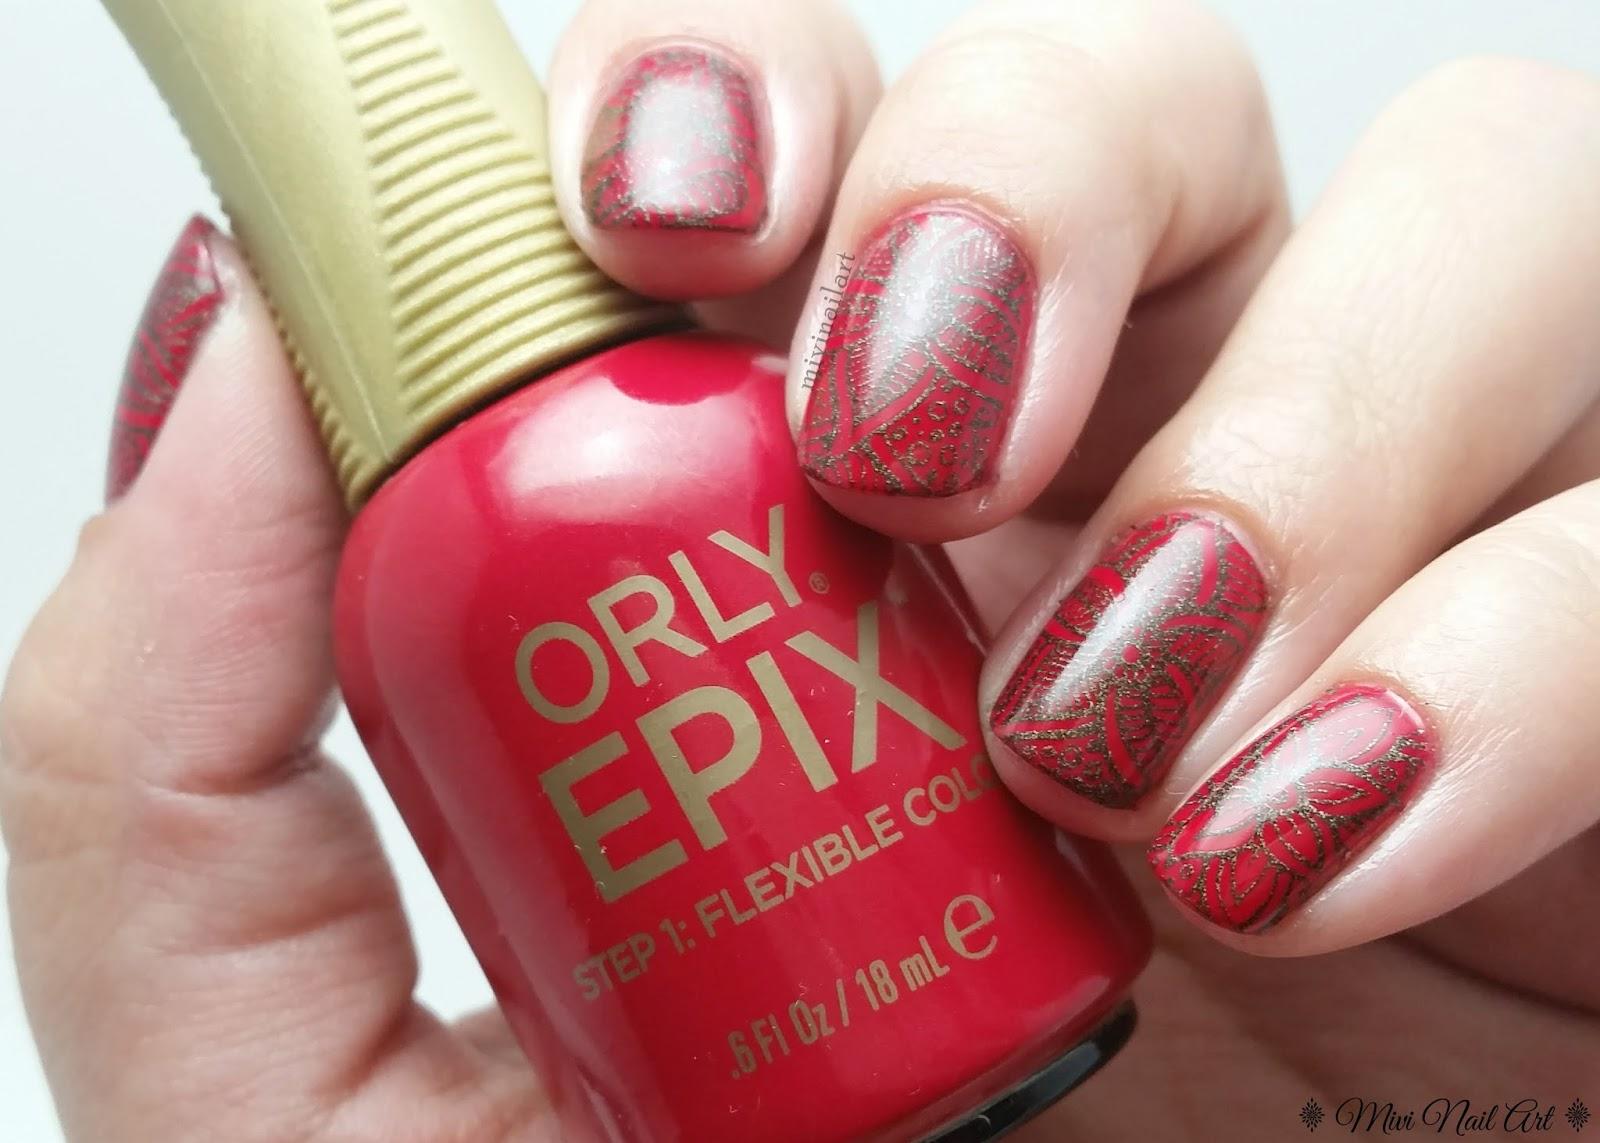 Orly Epix Flexible Color